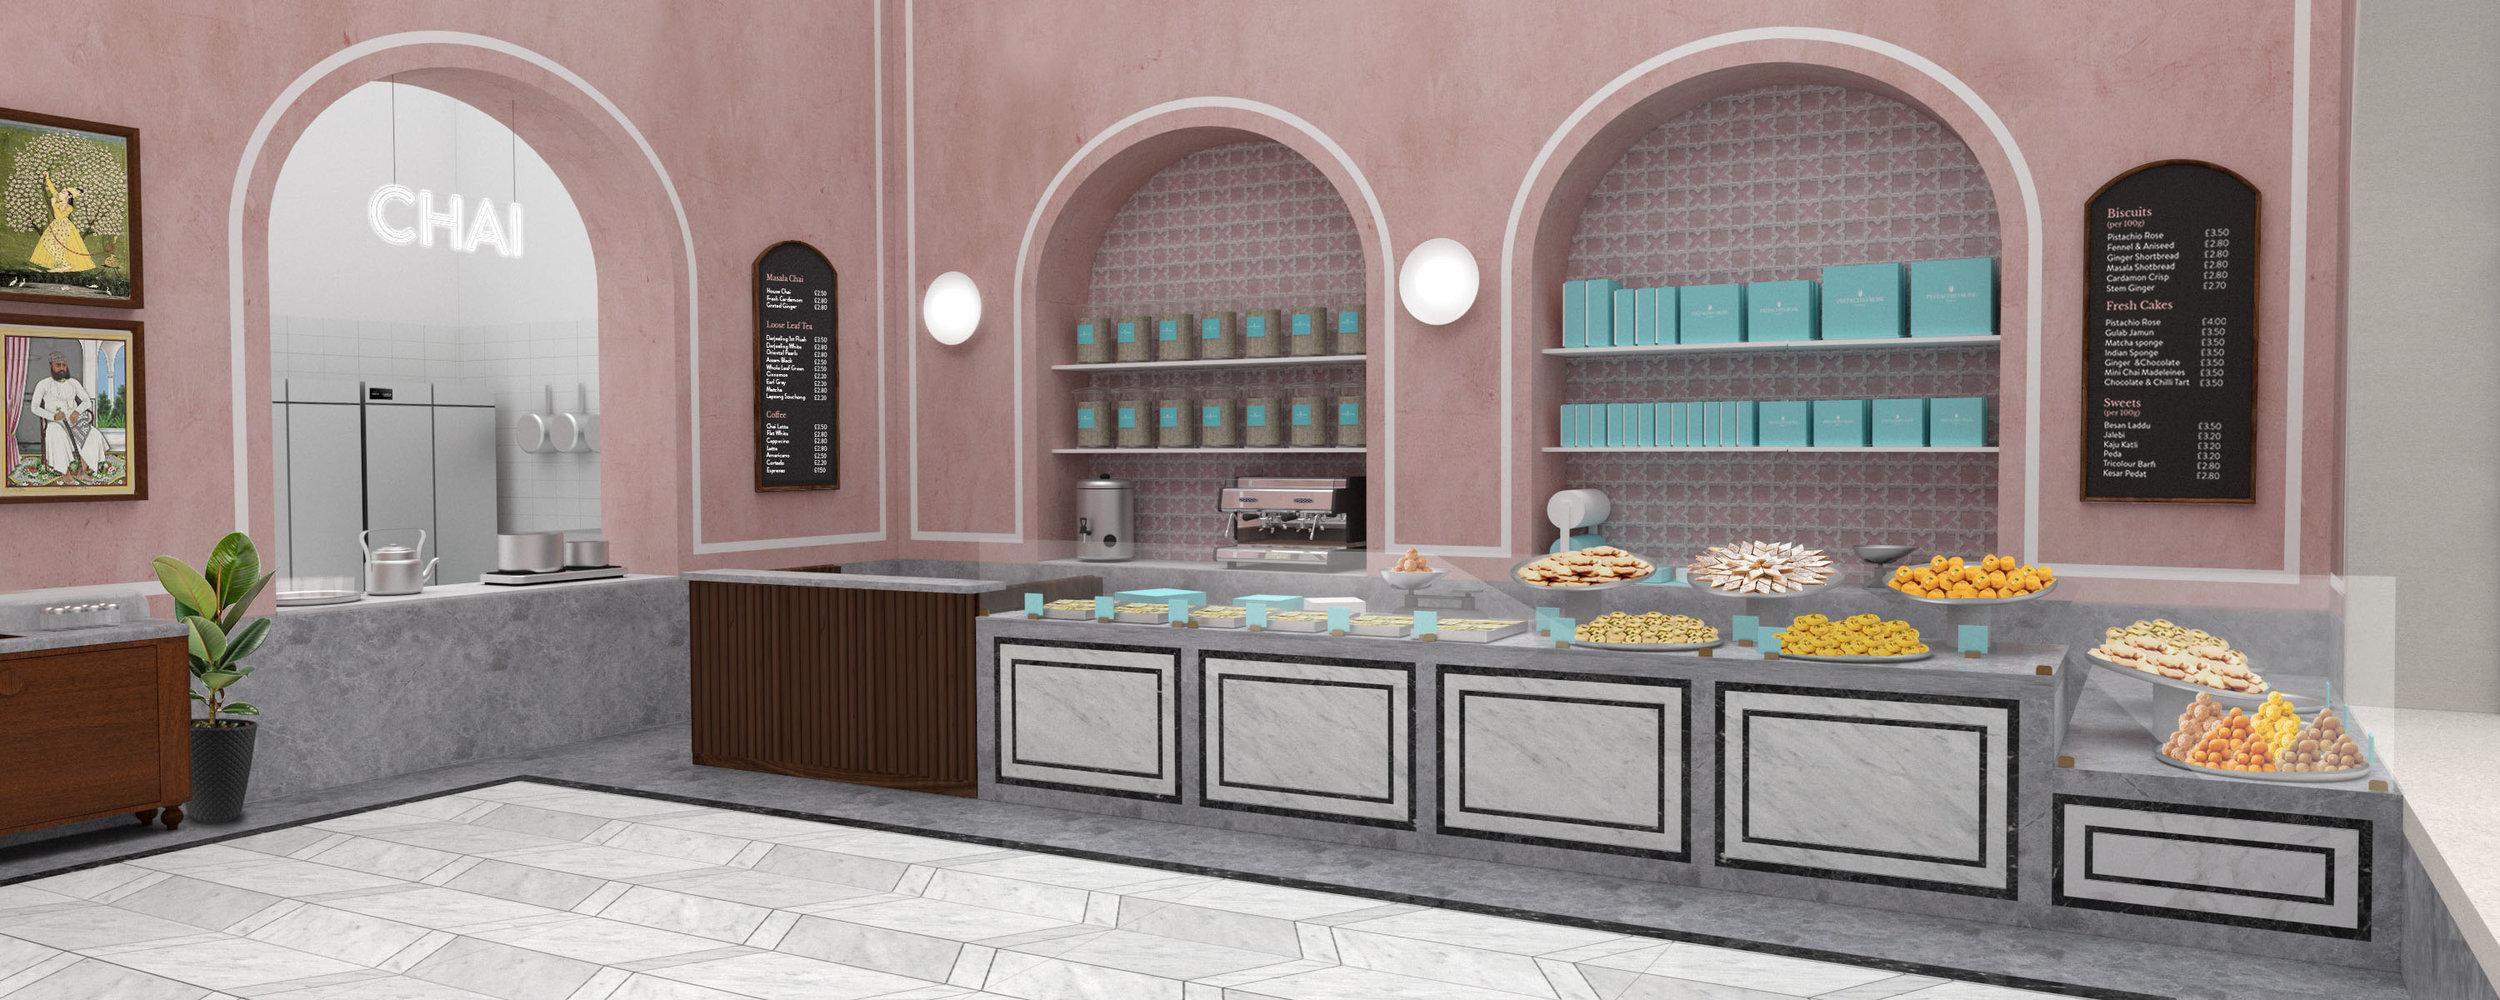 lunarlunar_interior_design_cafe_bakery_restaurant_pistachio_rose_counter.jpg